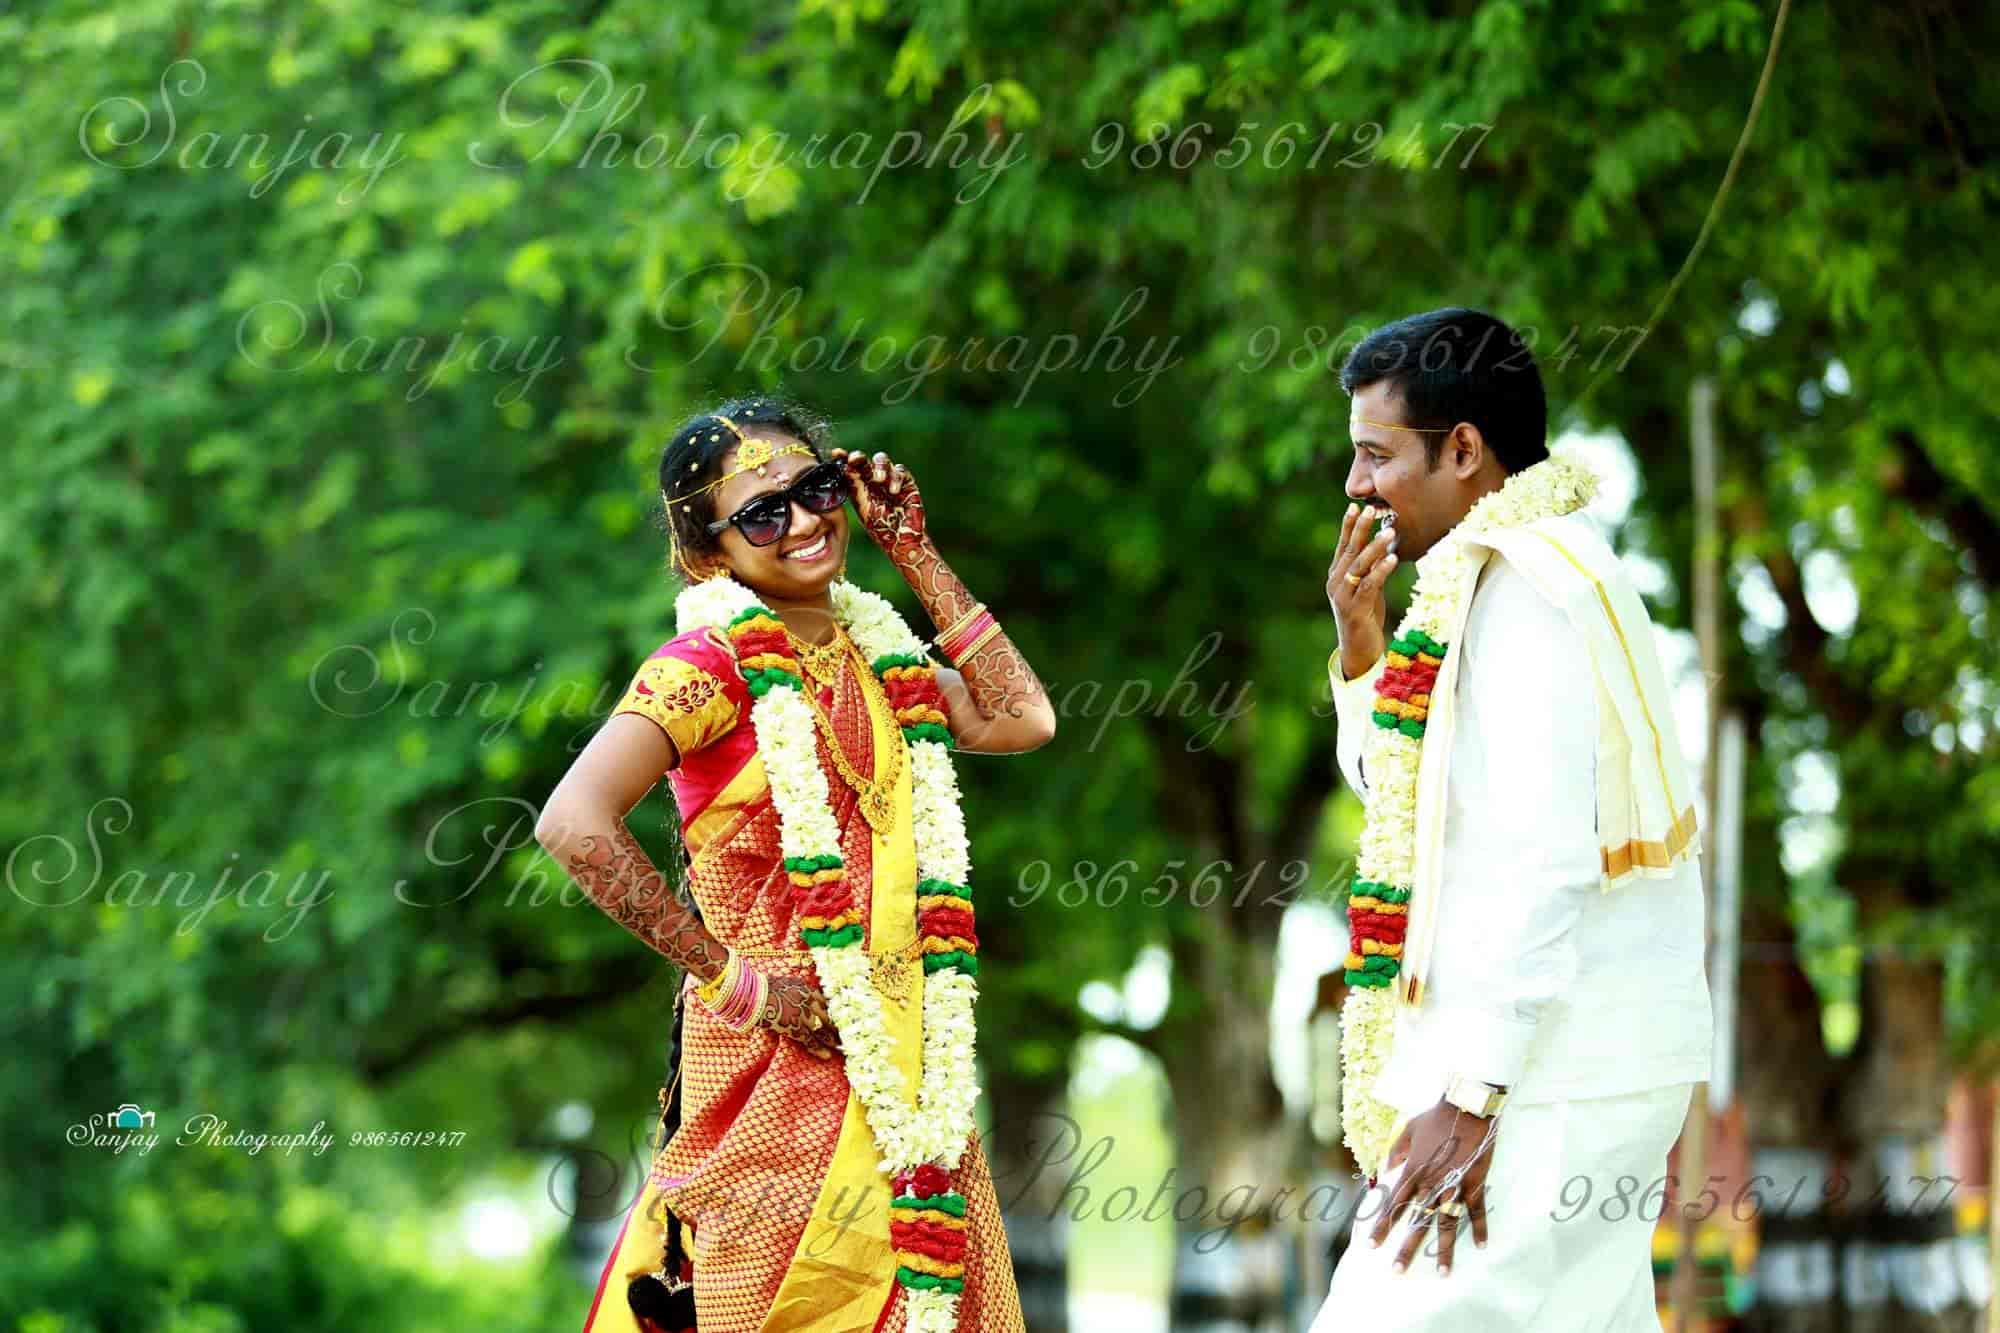 sanjay digital studio hd videos photos chithode erode pictures